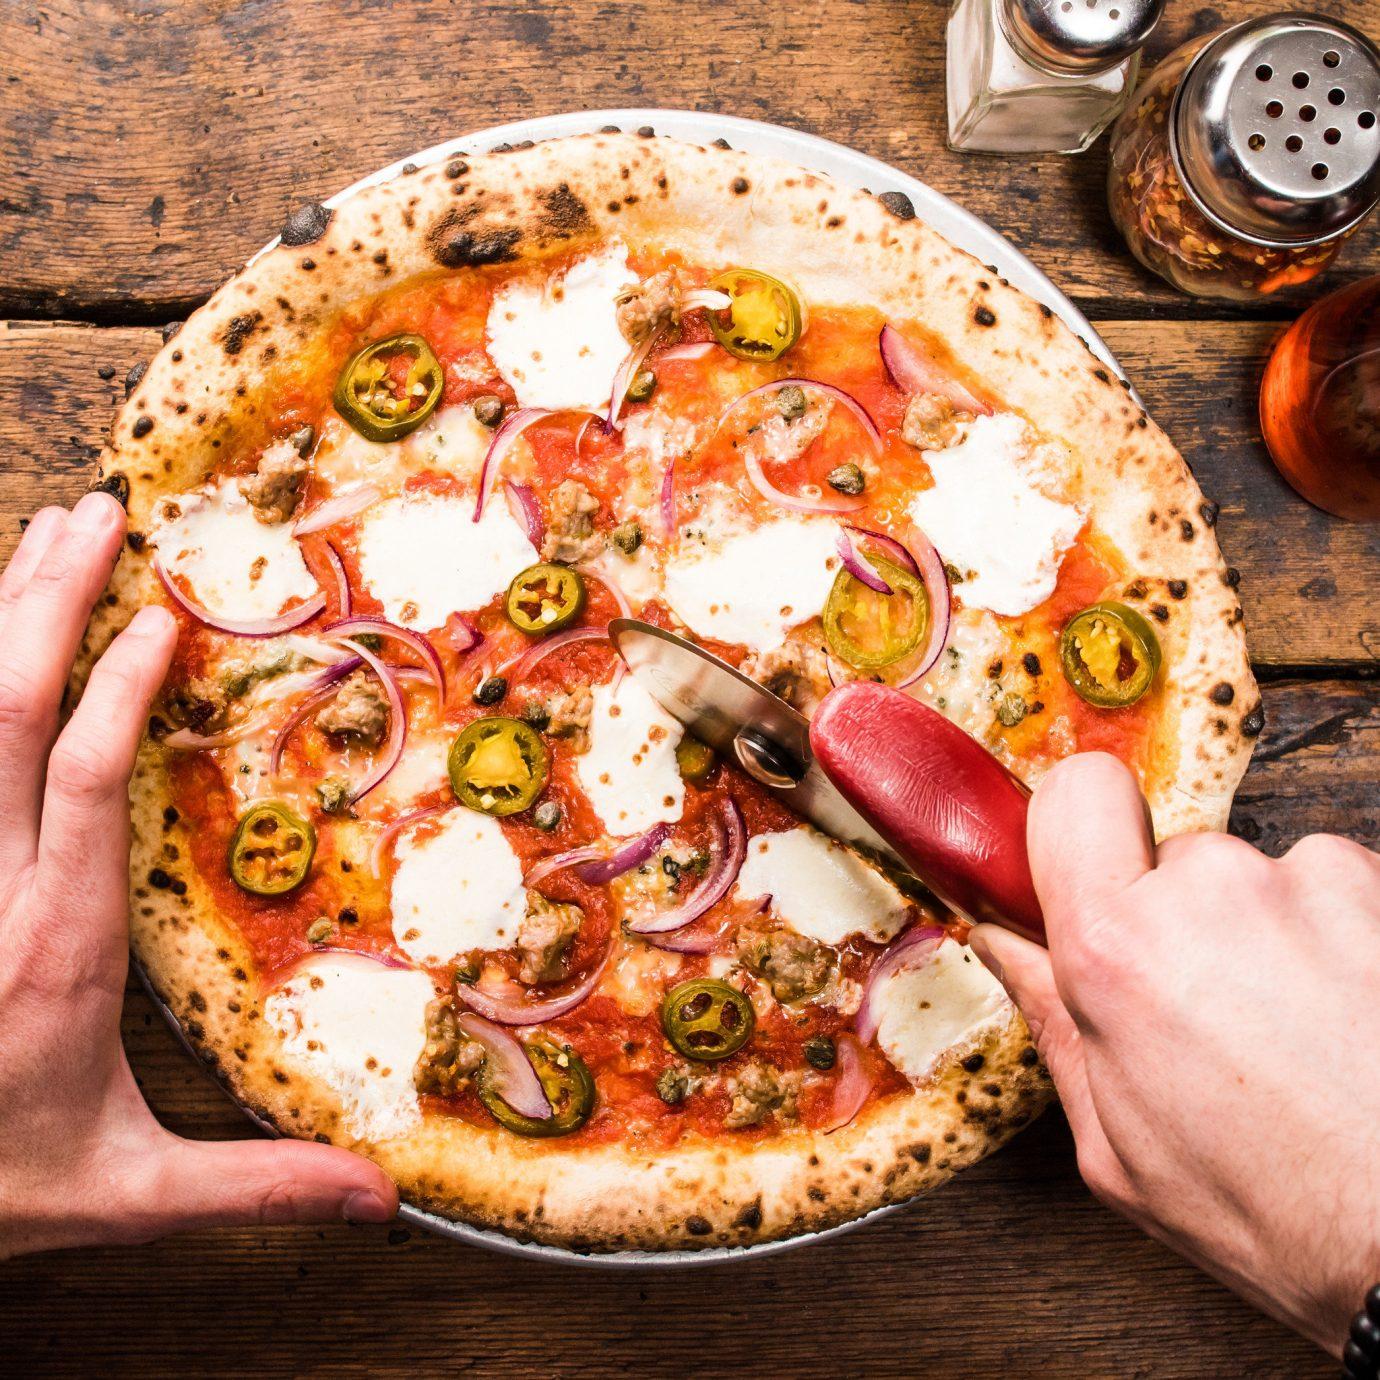 Brooklyn City Food + Drink NYC pizza dish person cuisine food italian food wooden european food pizza cheese california style pizza sicilian pizza junk food pizza stone recipe